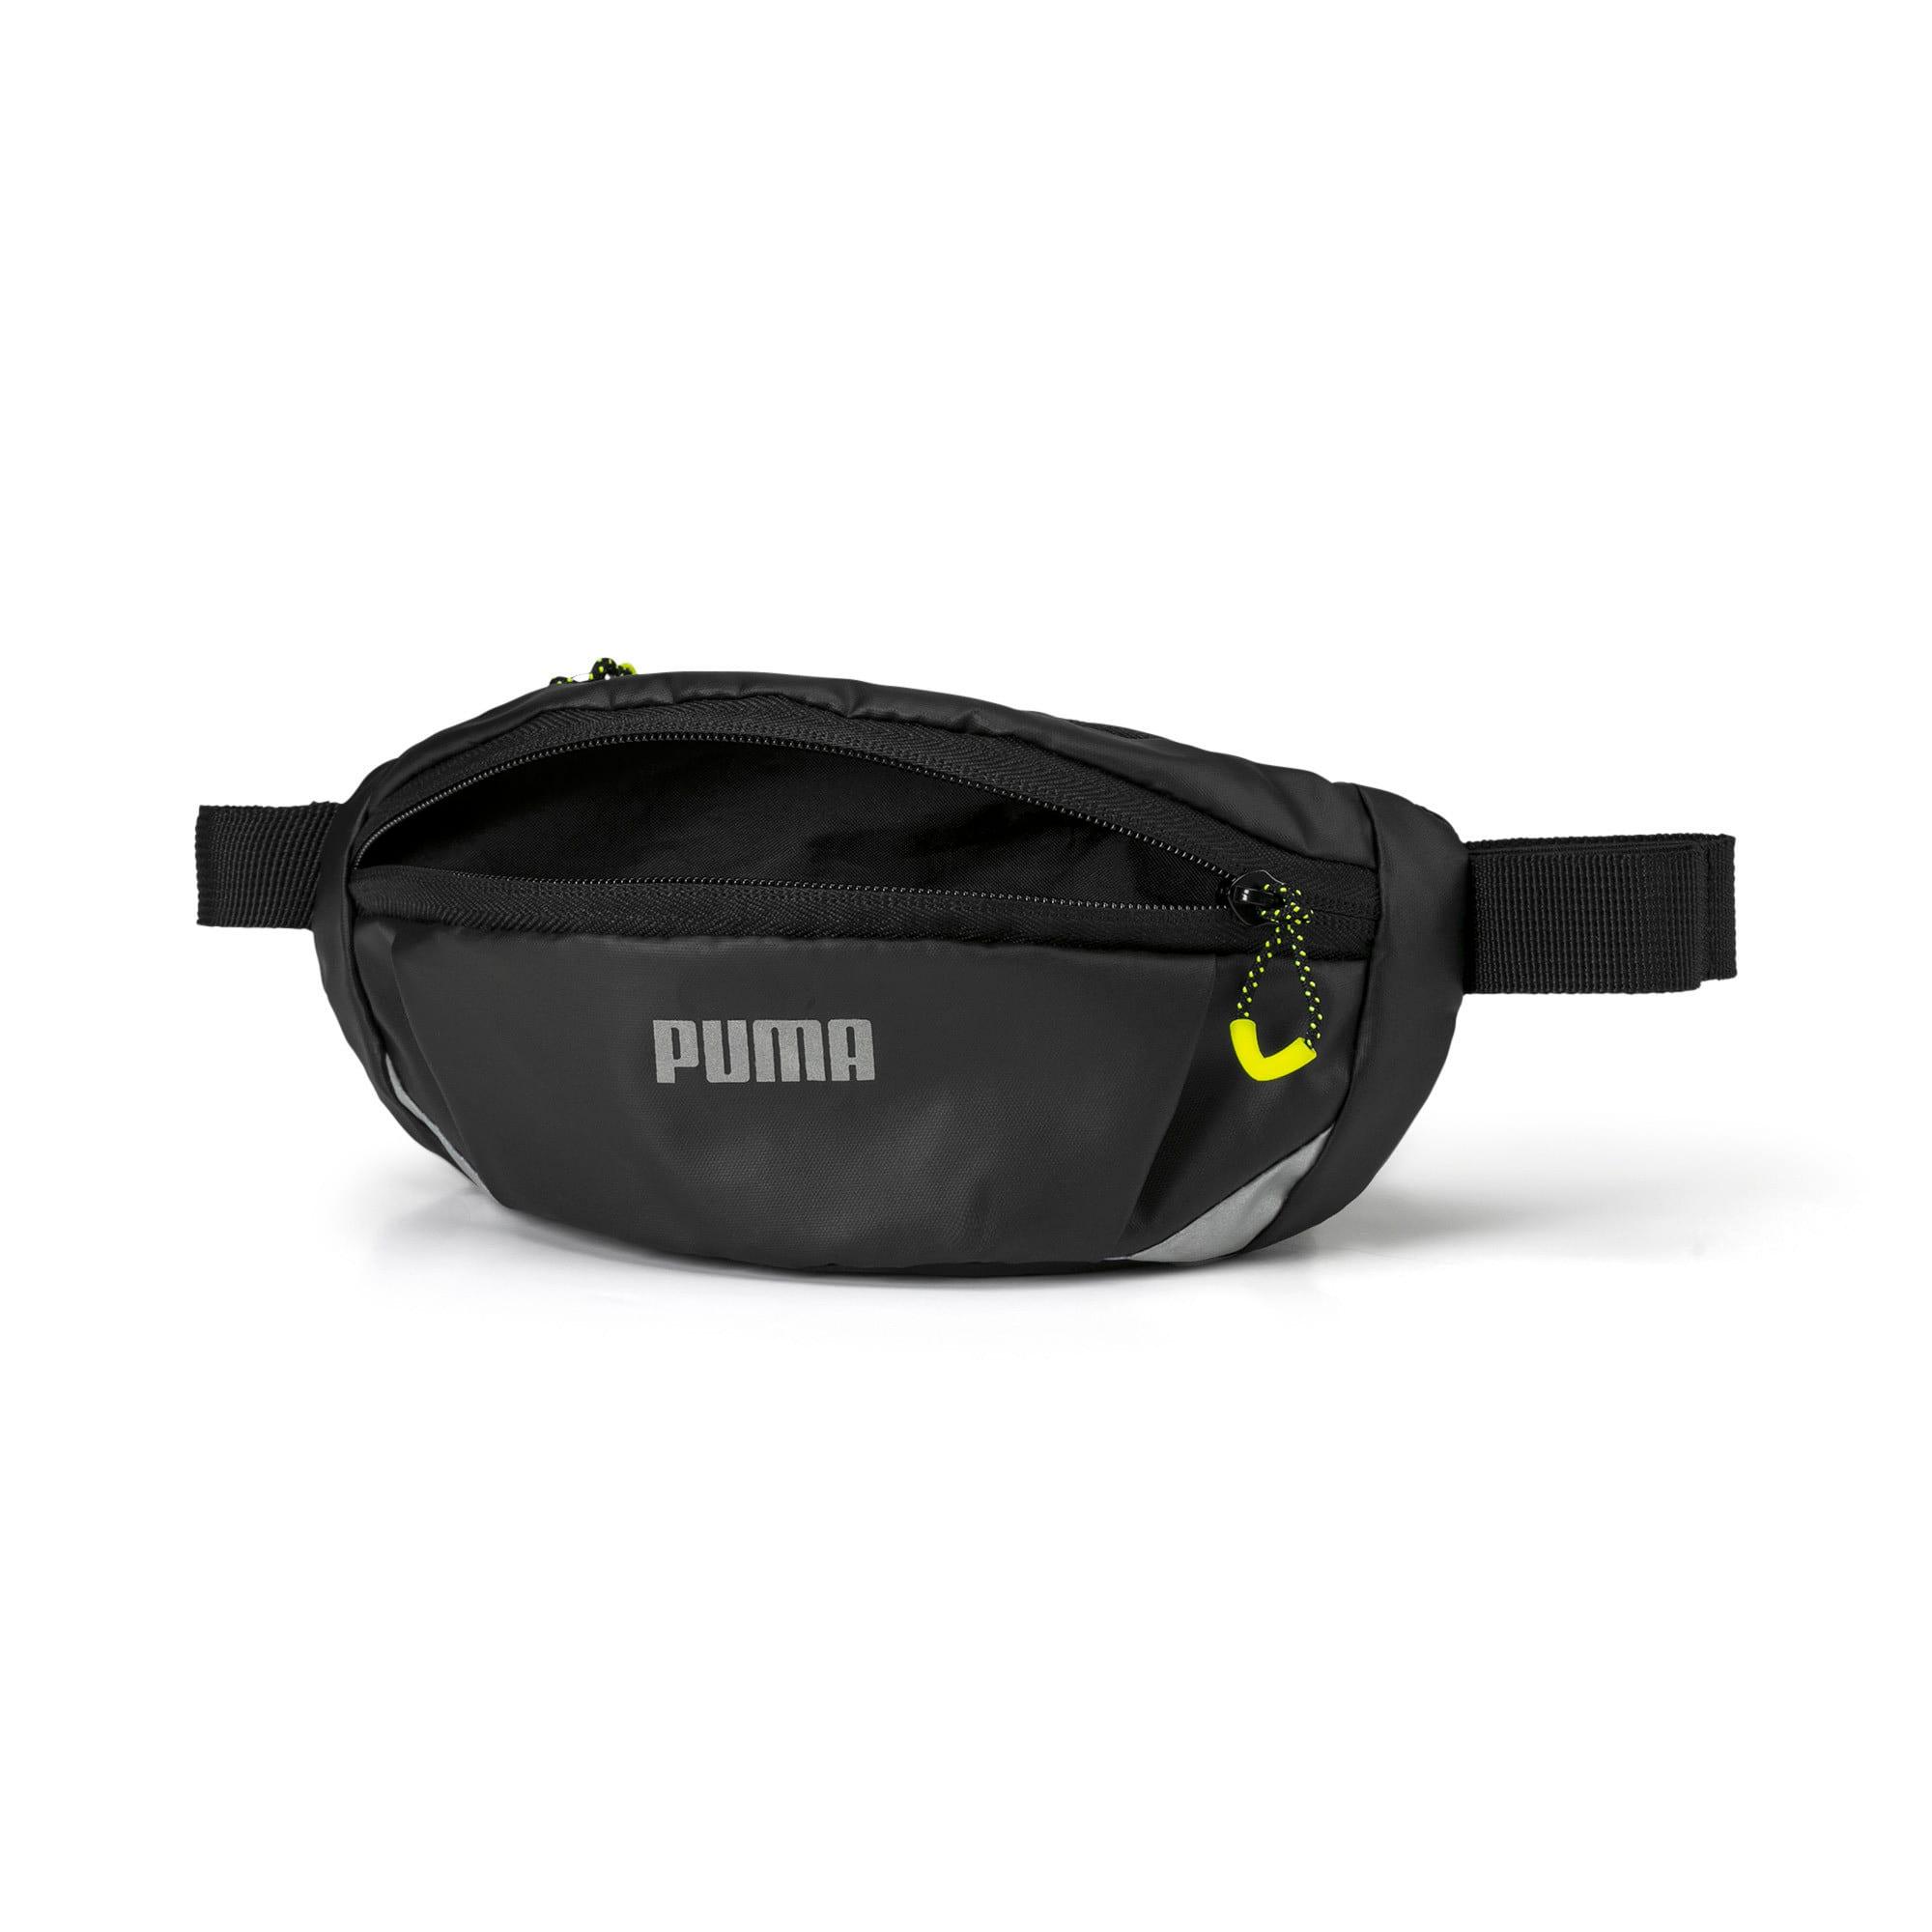 Thumbnail 5 of ランニング PR クラシック ウエストバッグ 0.8L, Puma Black-Yellow Alert, medium-JPN